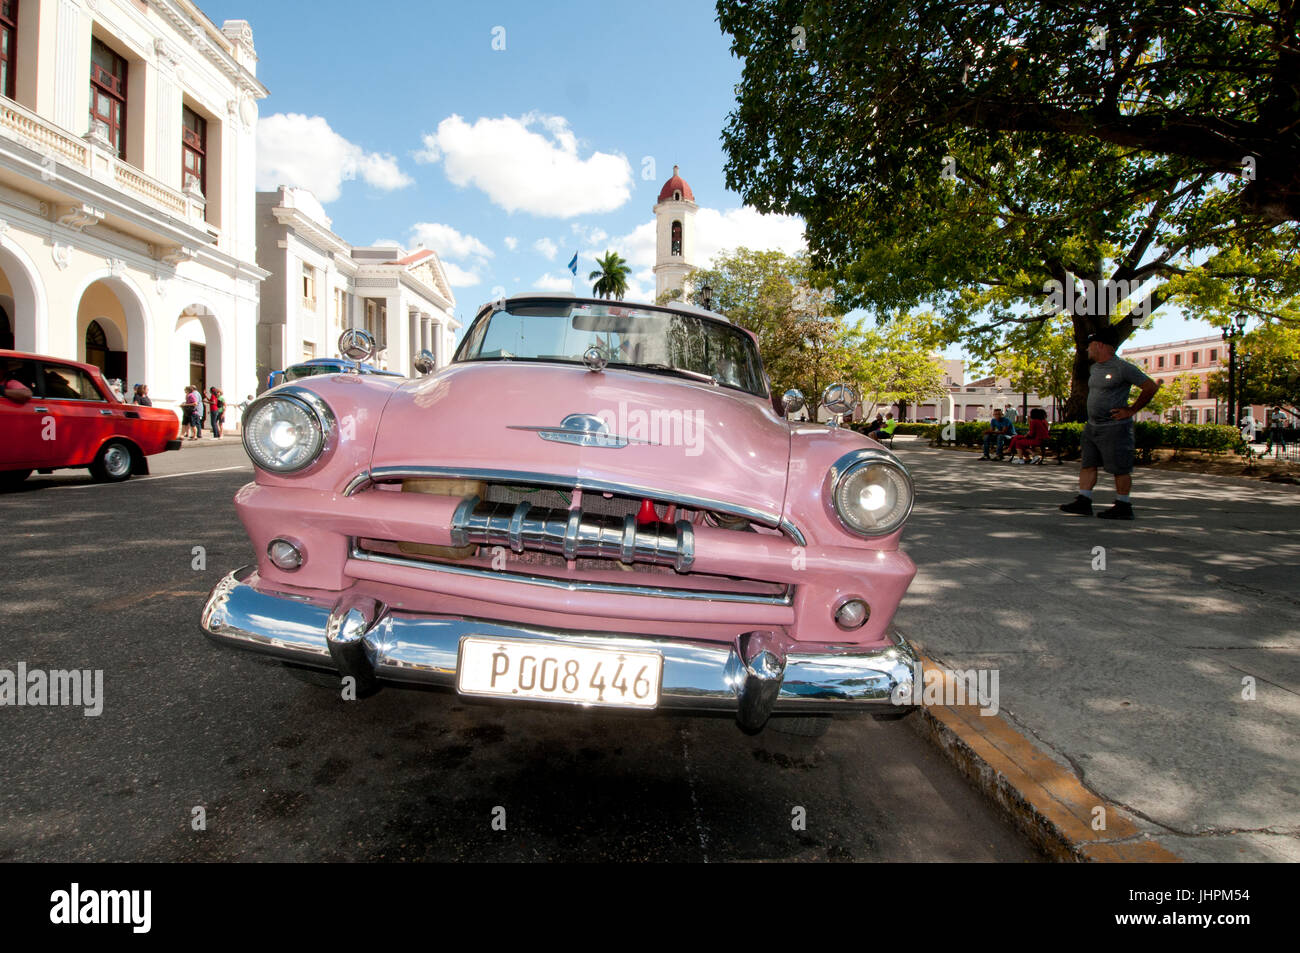 1953 Plymouth convertible in excellent condition in Cienfuegos Cuba - Stock Image